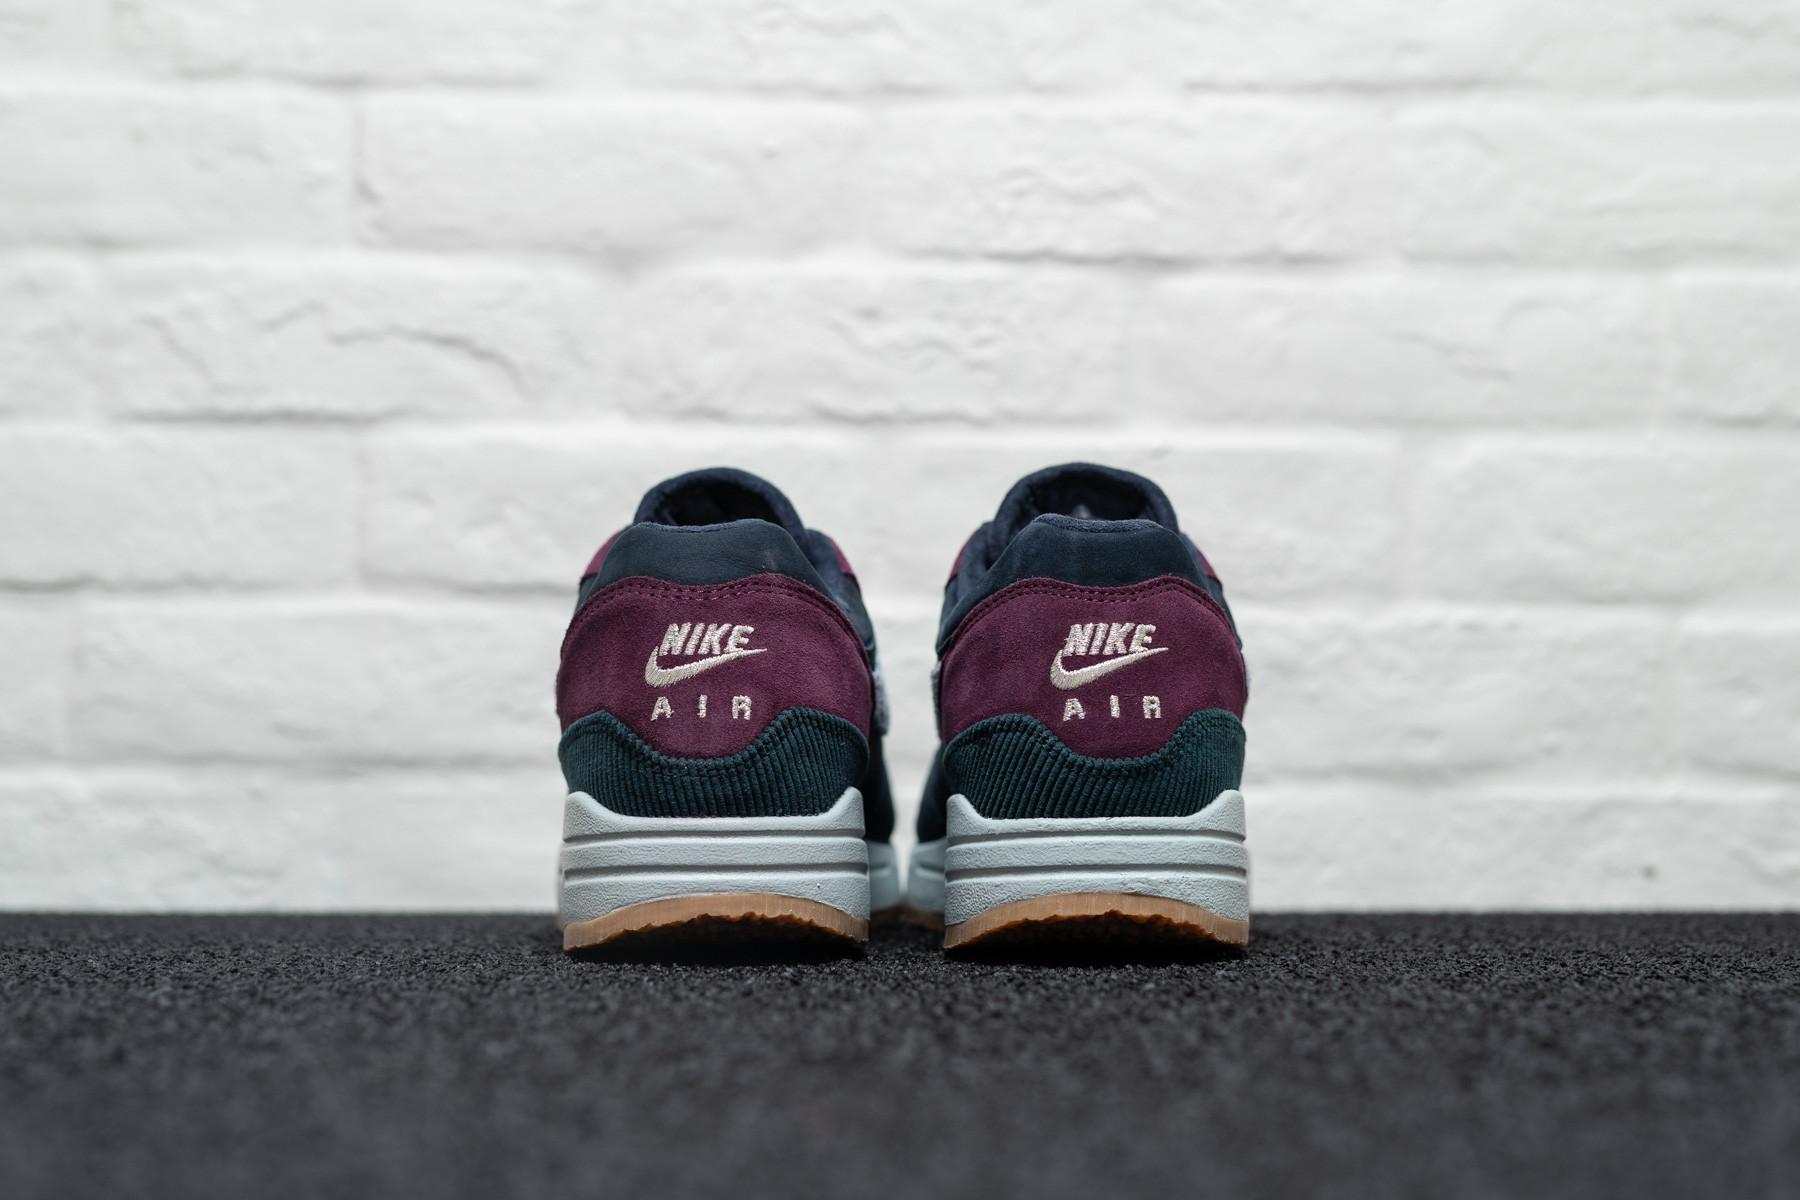 Nike Air Max 1 Patch Black